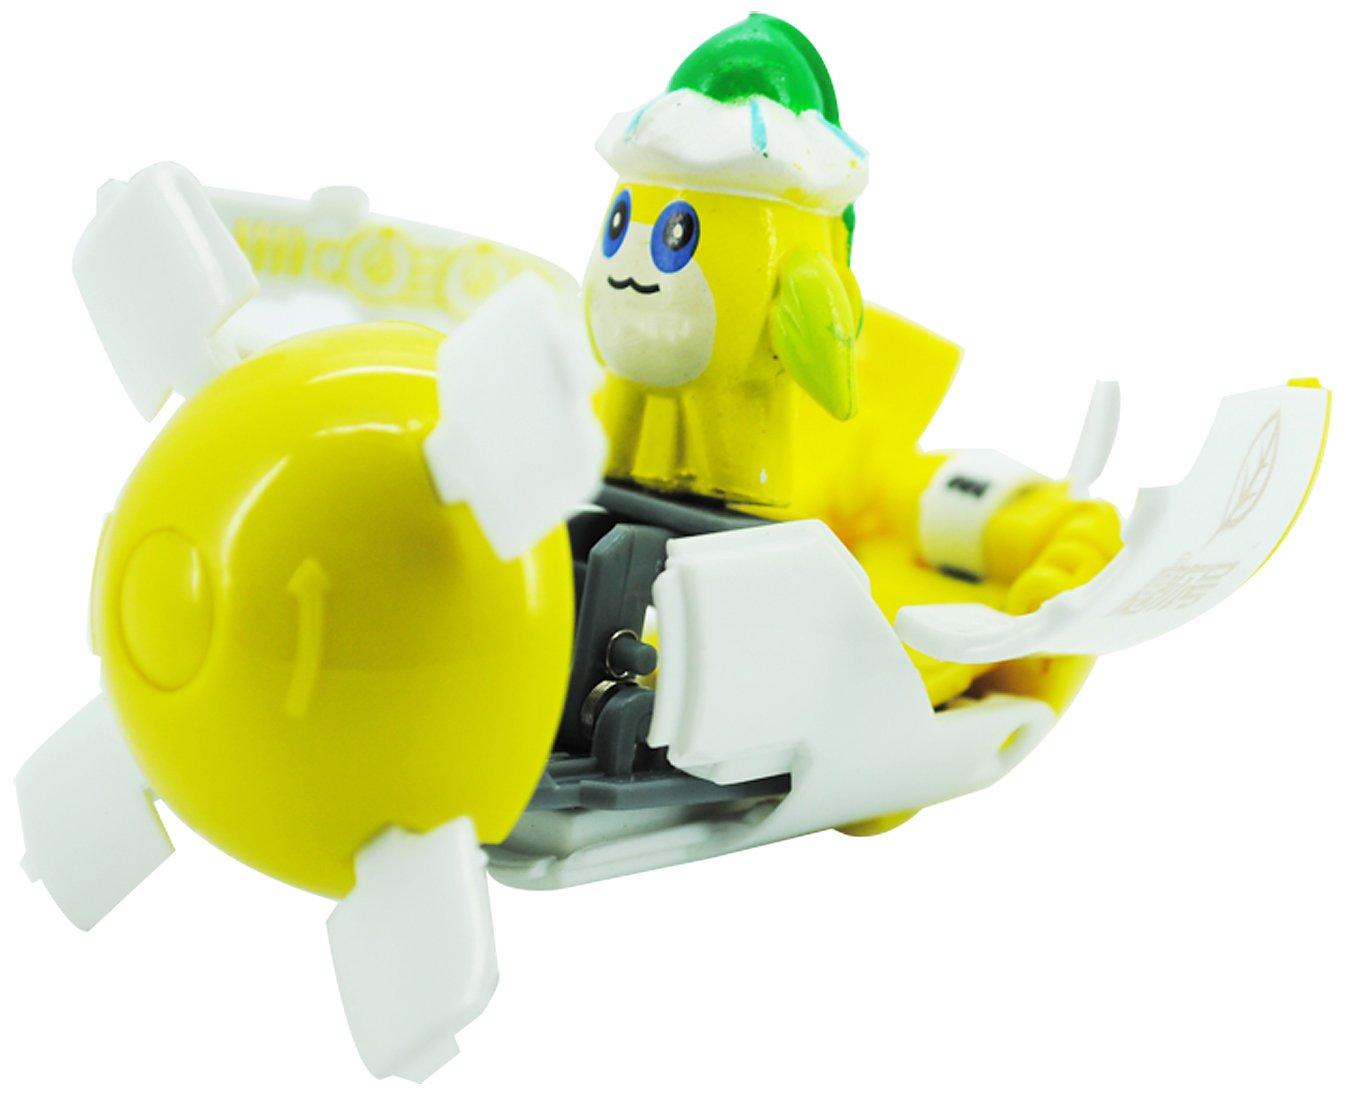 taomee 淘米 赛尔号精灵爆旋玩具 光明的救赎 小豆芽